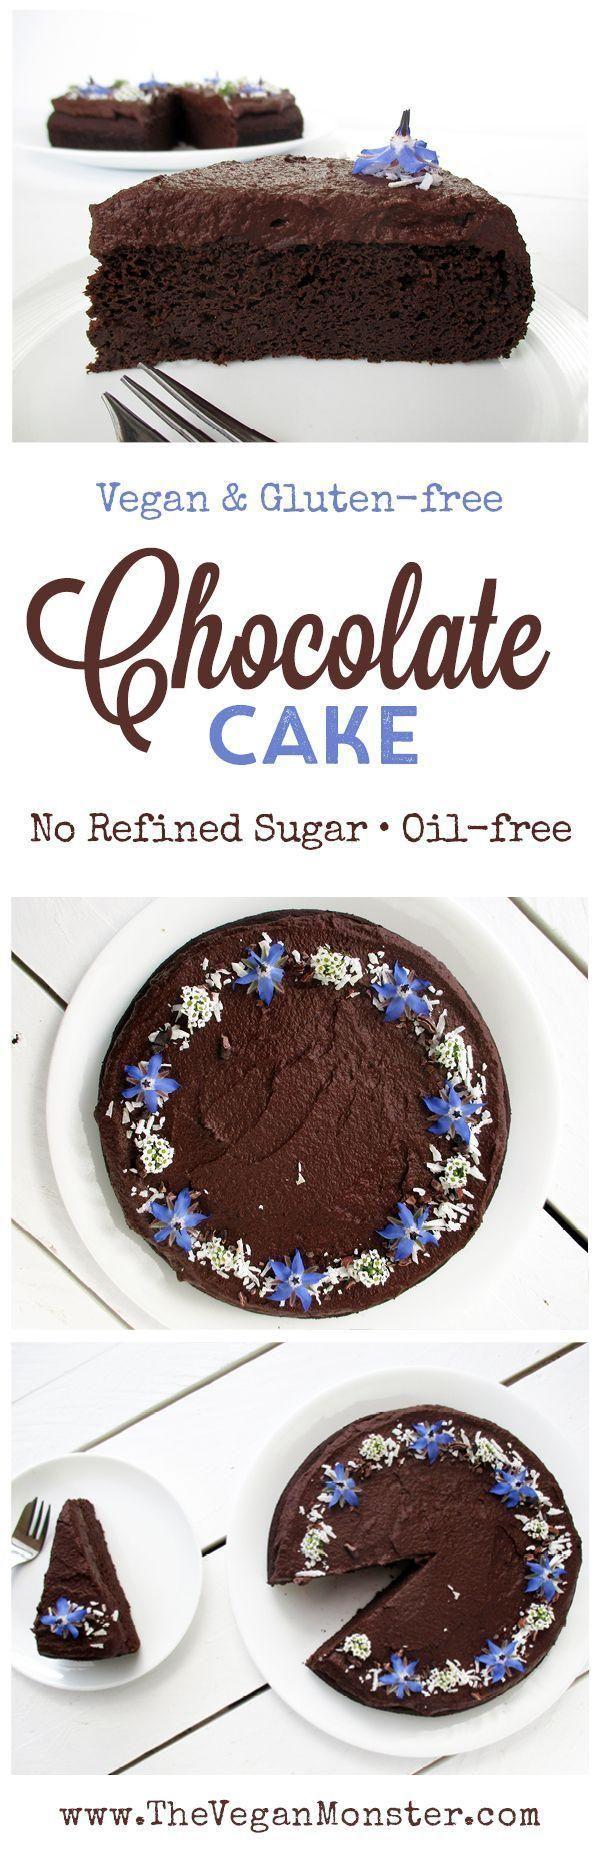 Vegan Gluten-free Oil-free Refined Sugar Free Soy-free Easy Chocolate Cake Recip...  - Vegan & Glutenfrei (Gruppenboard) -